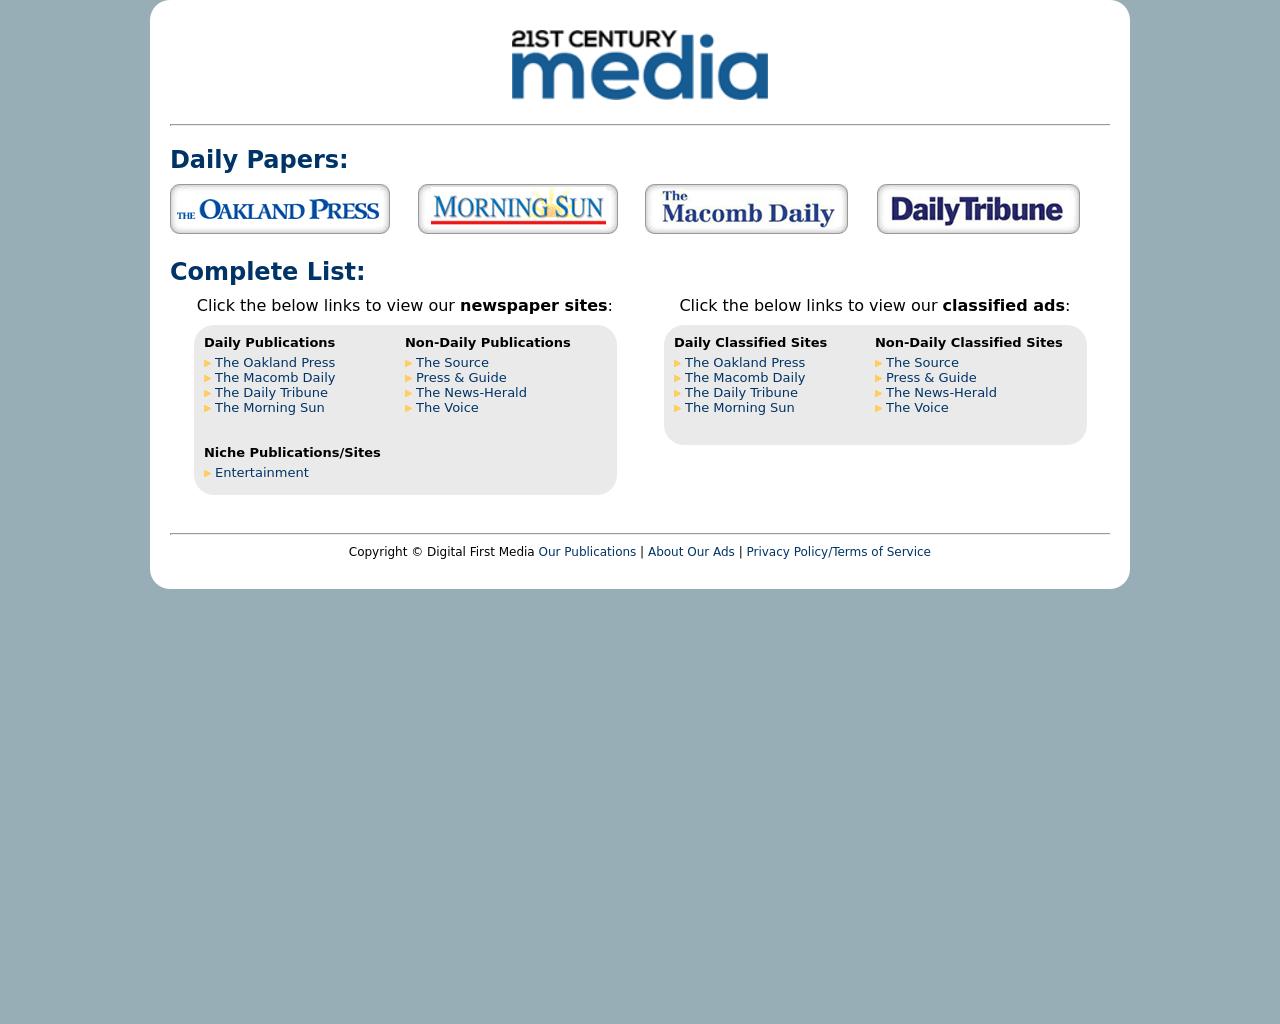 21st-Century-Media-Advertising-Reviews-Pricing